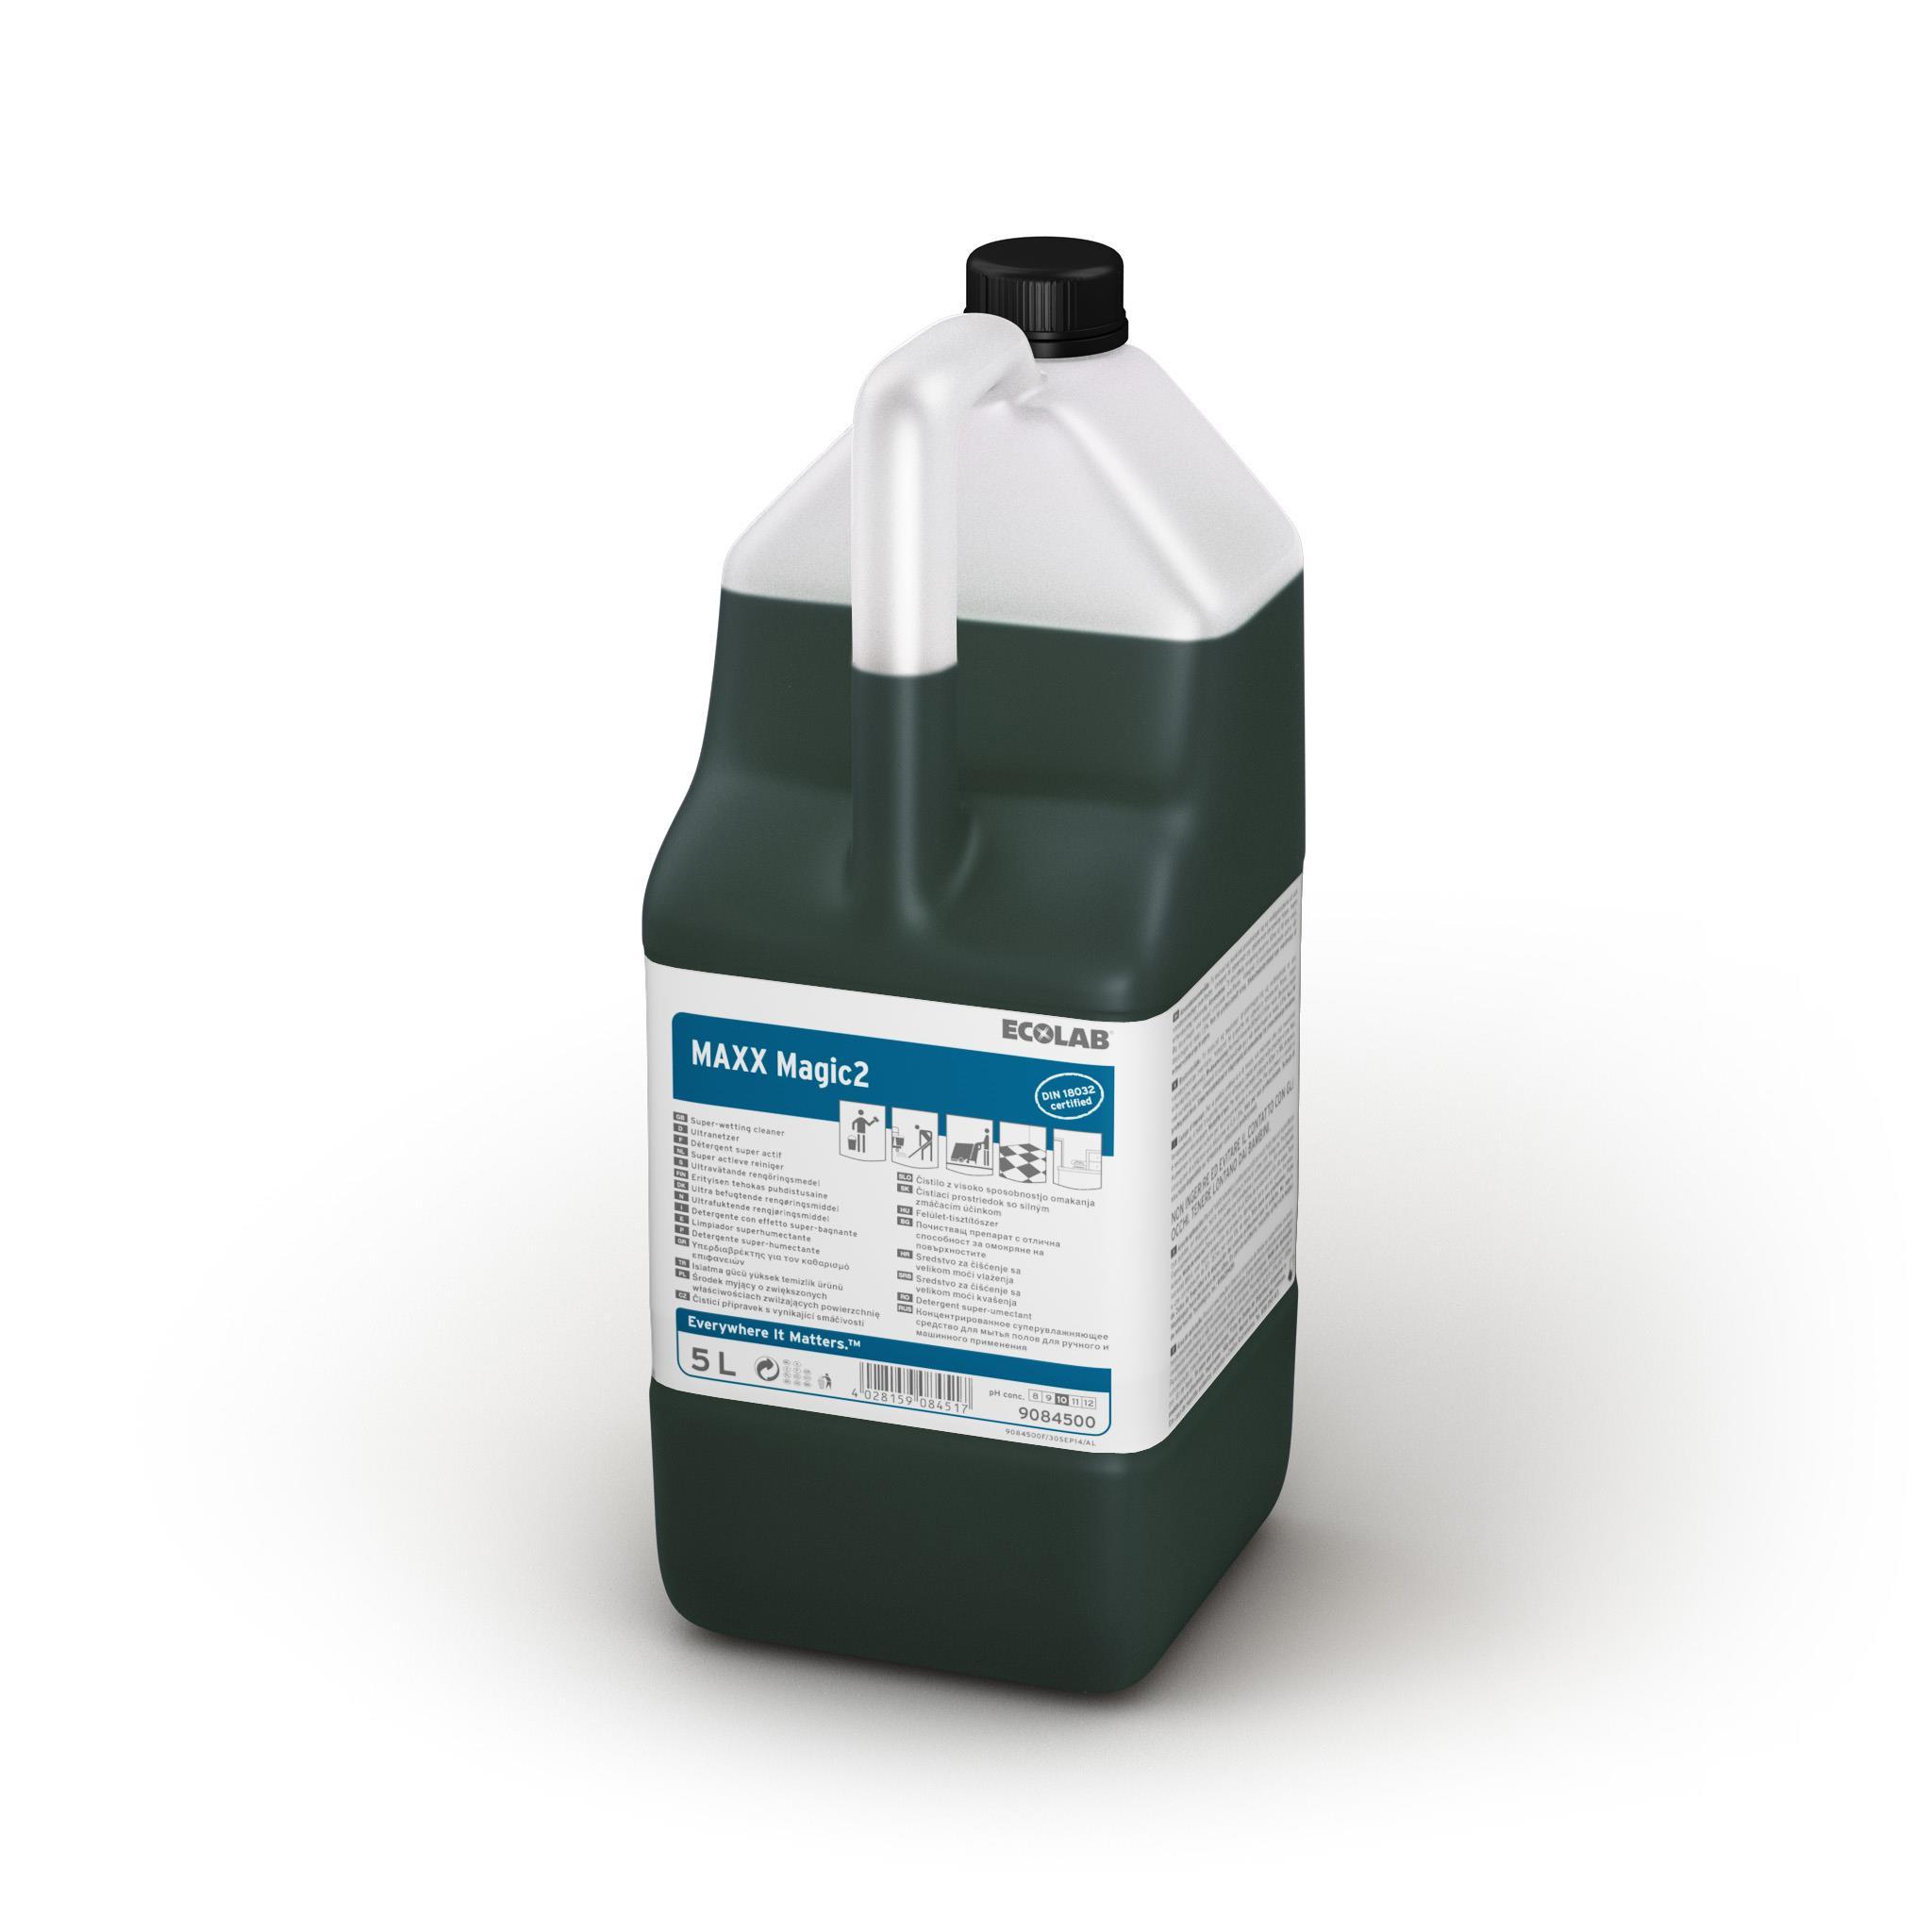 Detergent Superumectant Universal Manual/Automat De Inalta Performanta Maxx2 Magic 5l Ecolab sanito.ro